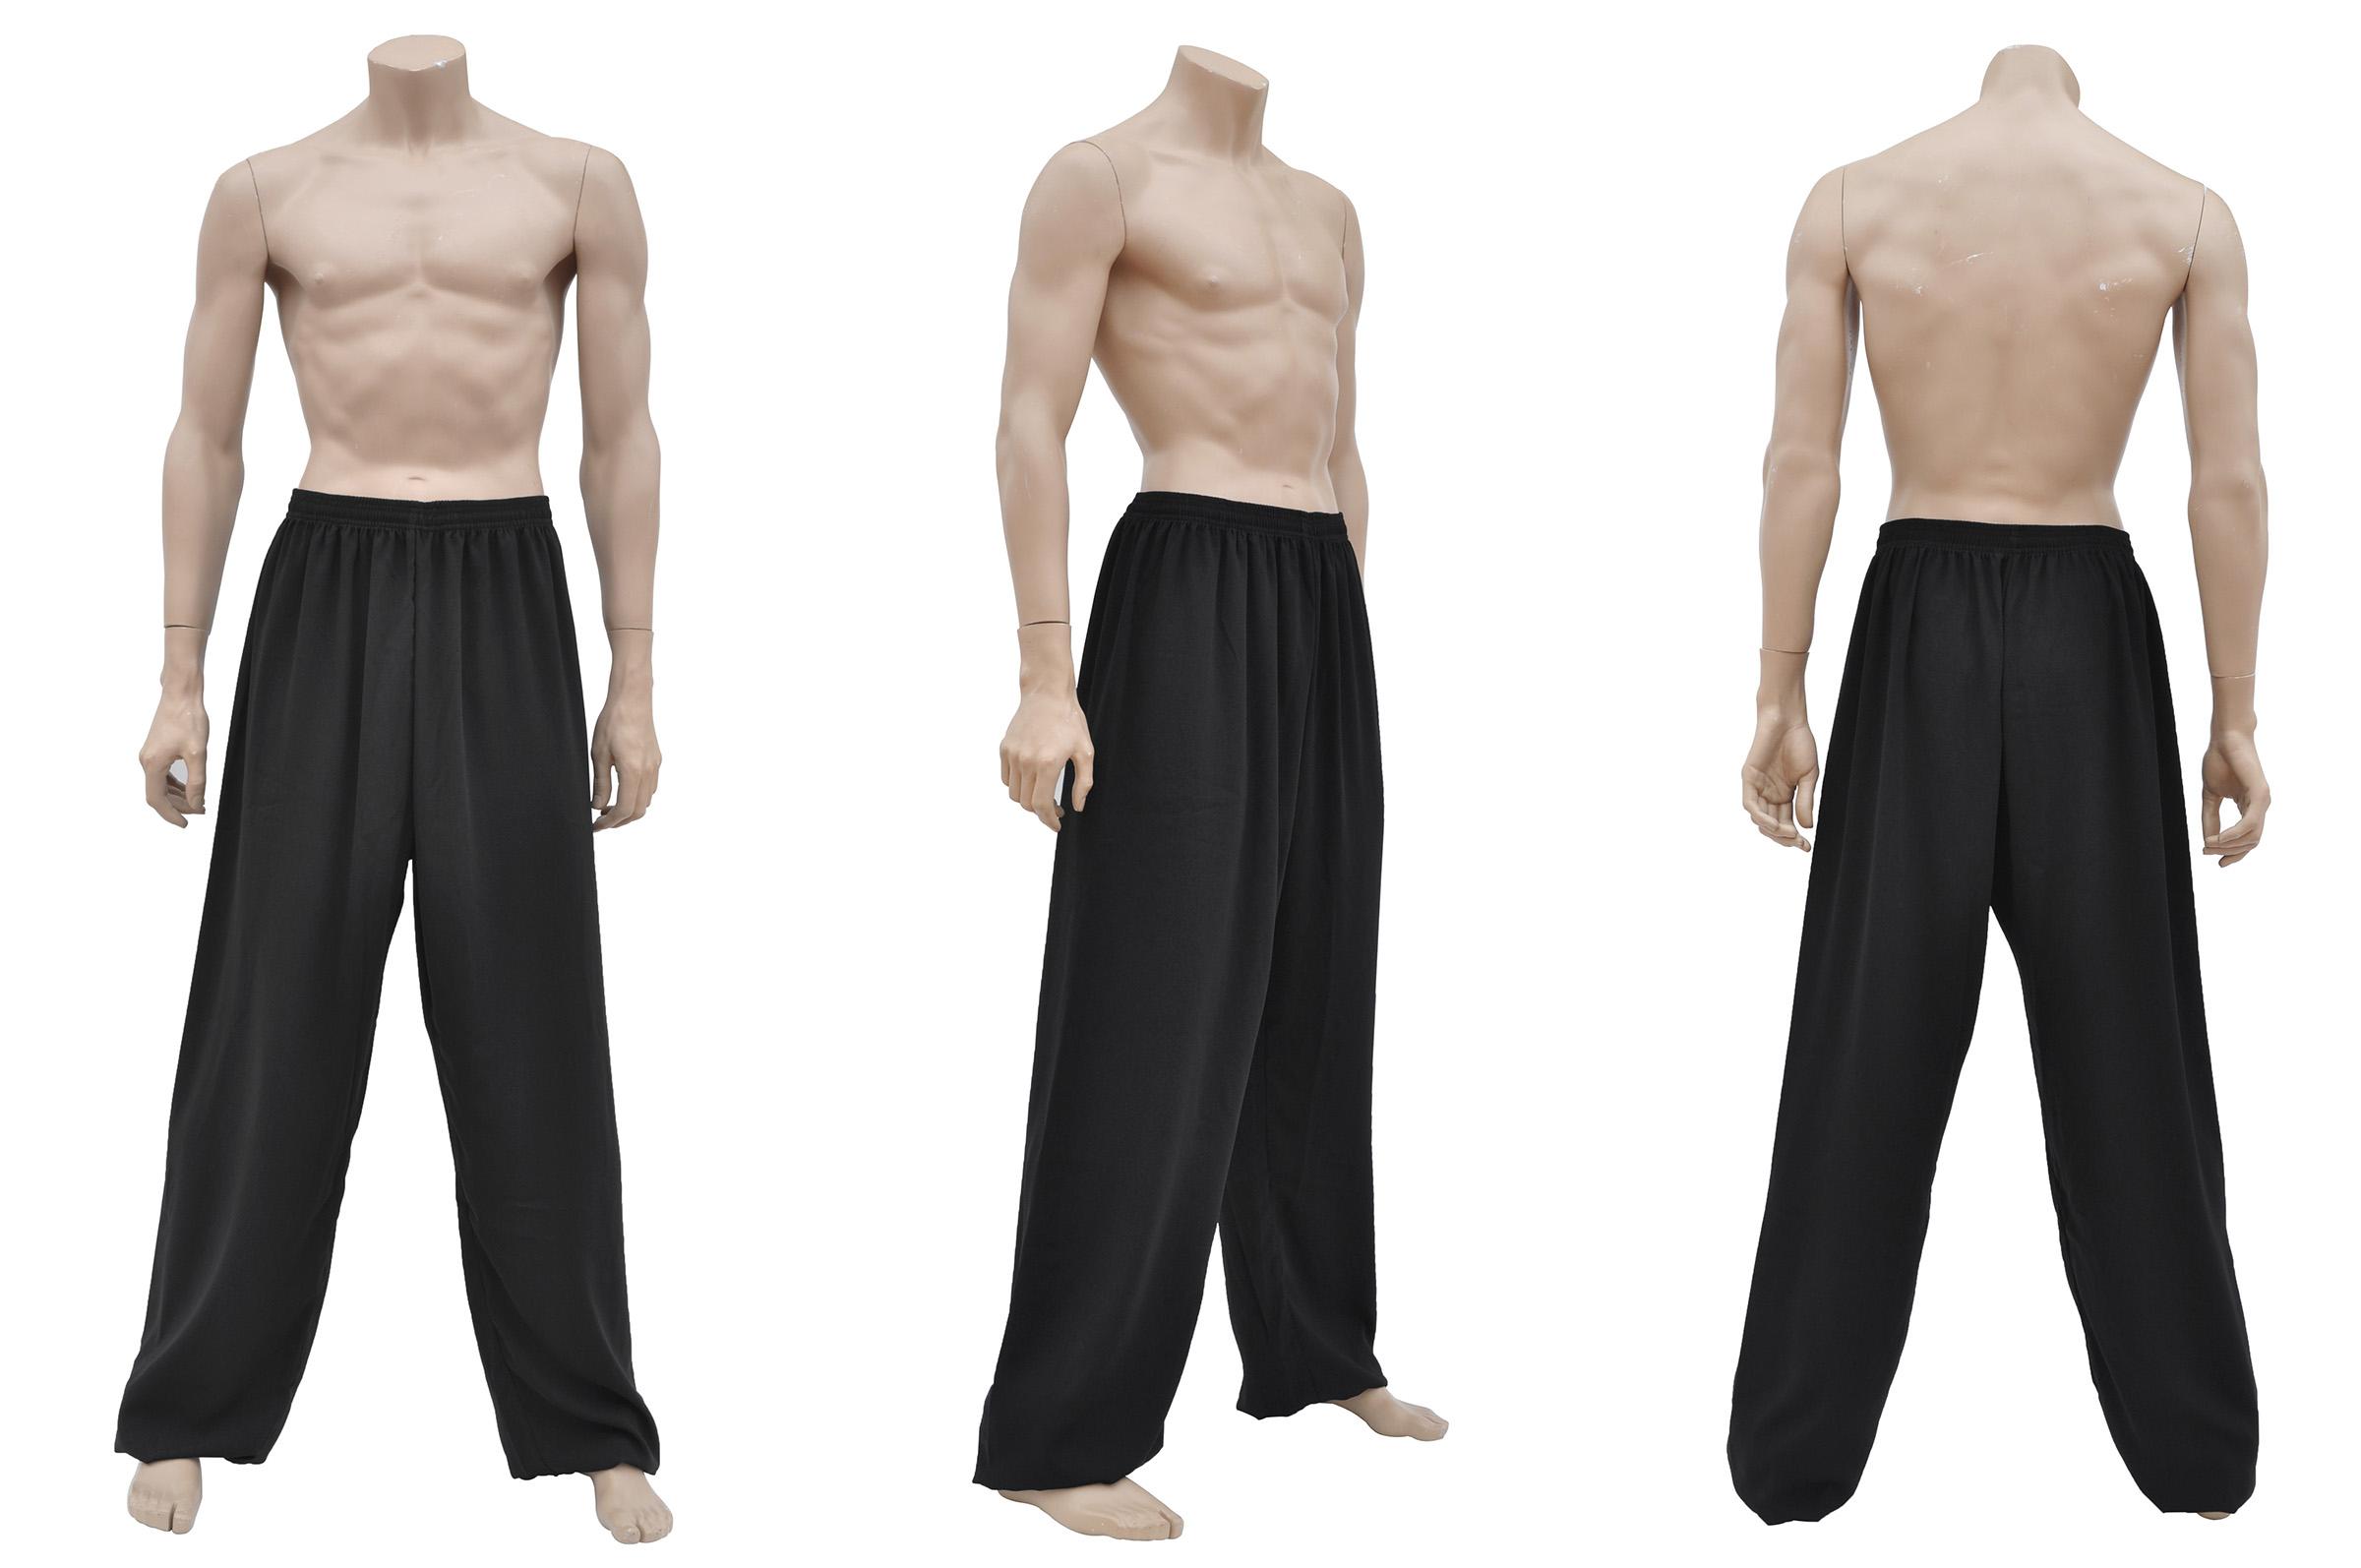 Pantalon Kung-fu, Tai Chi, Classique Haut de Gamme